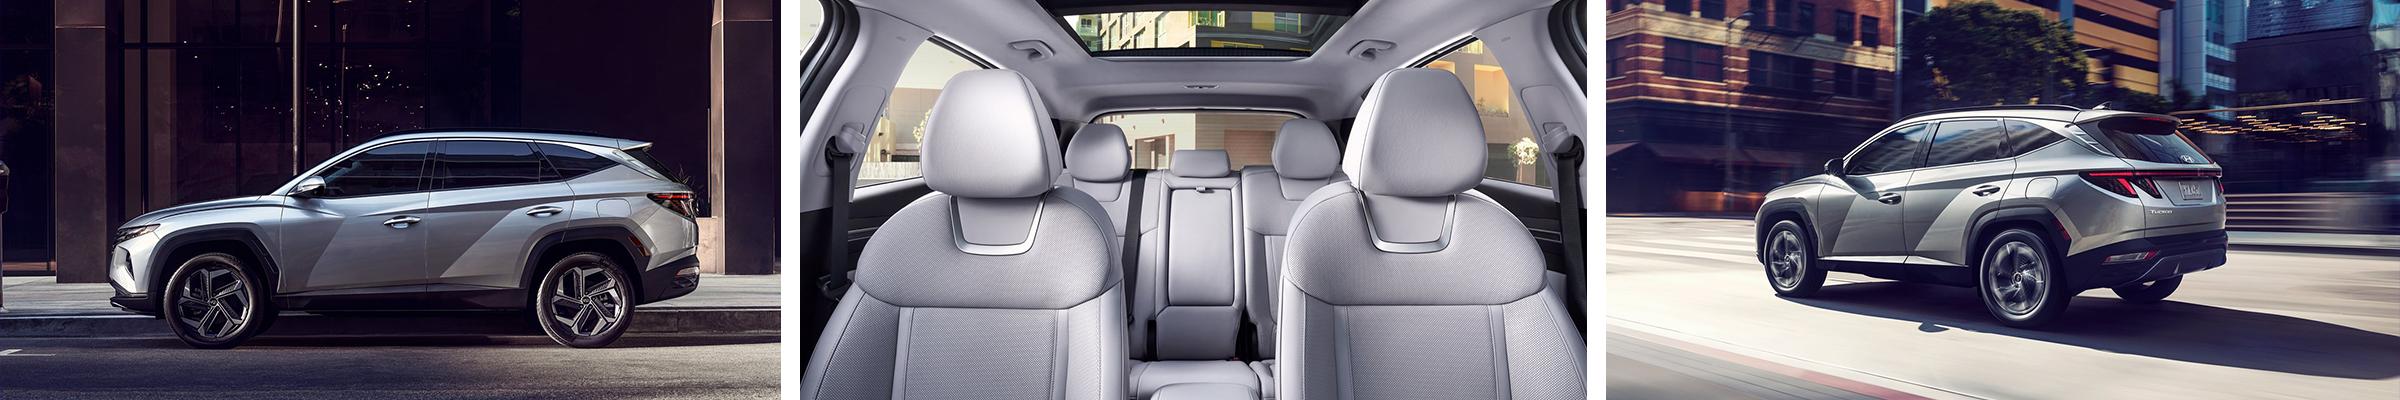 2022 Hyundai Tucson For Sale Dearborn MI | Detroit